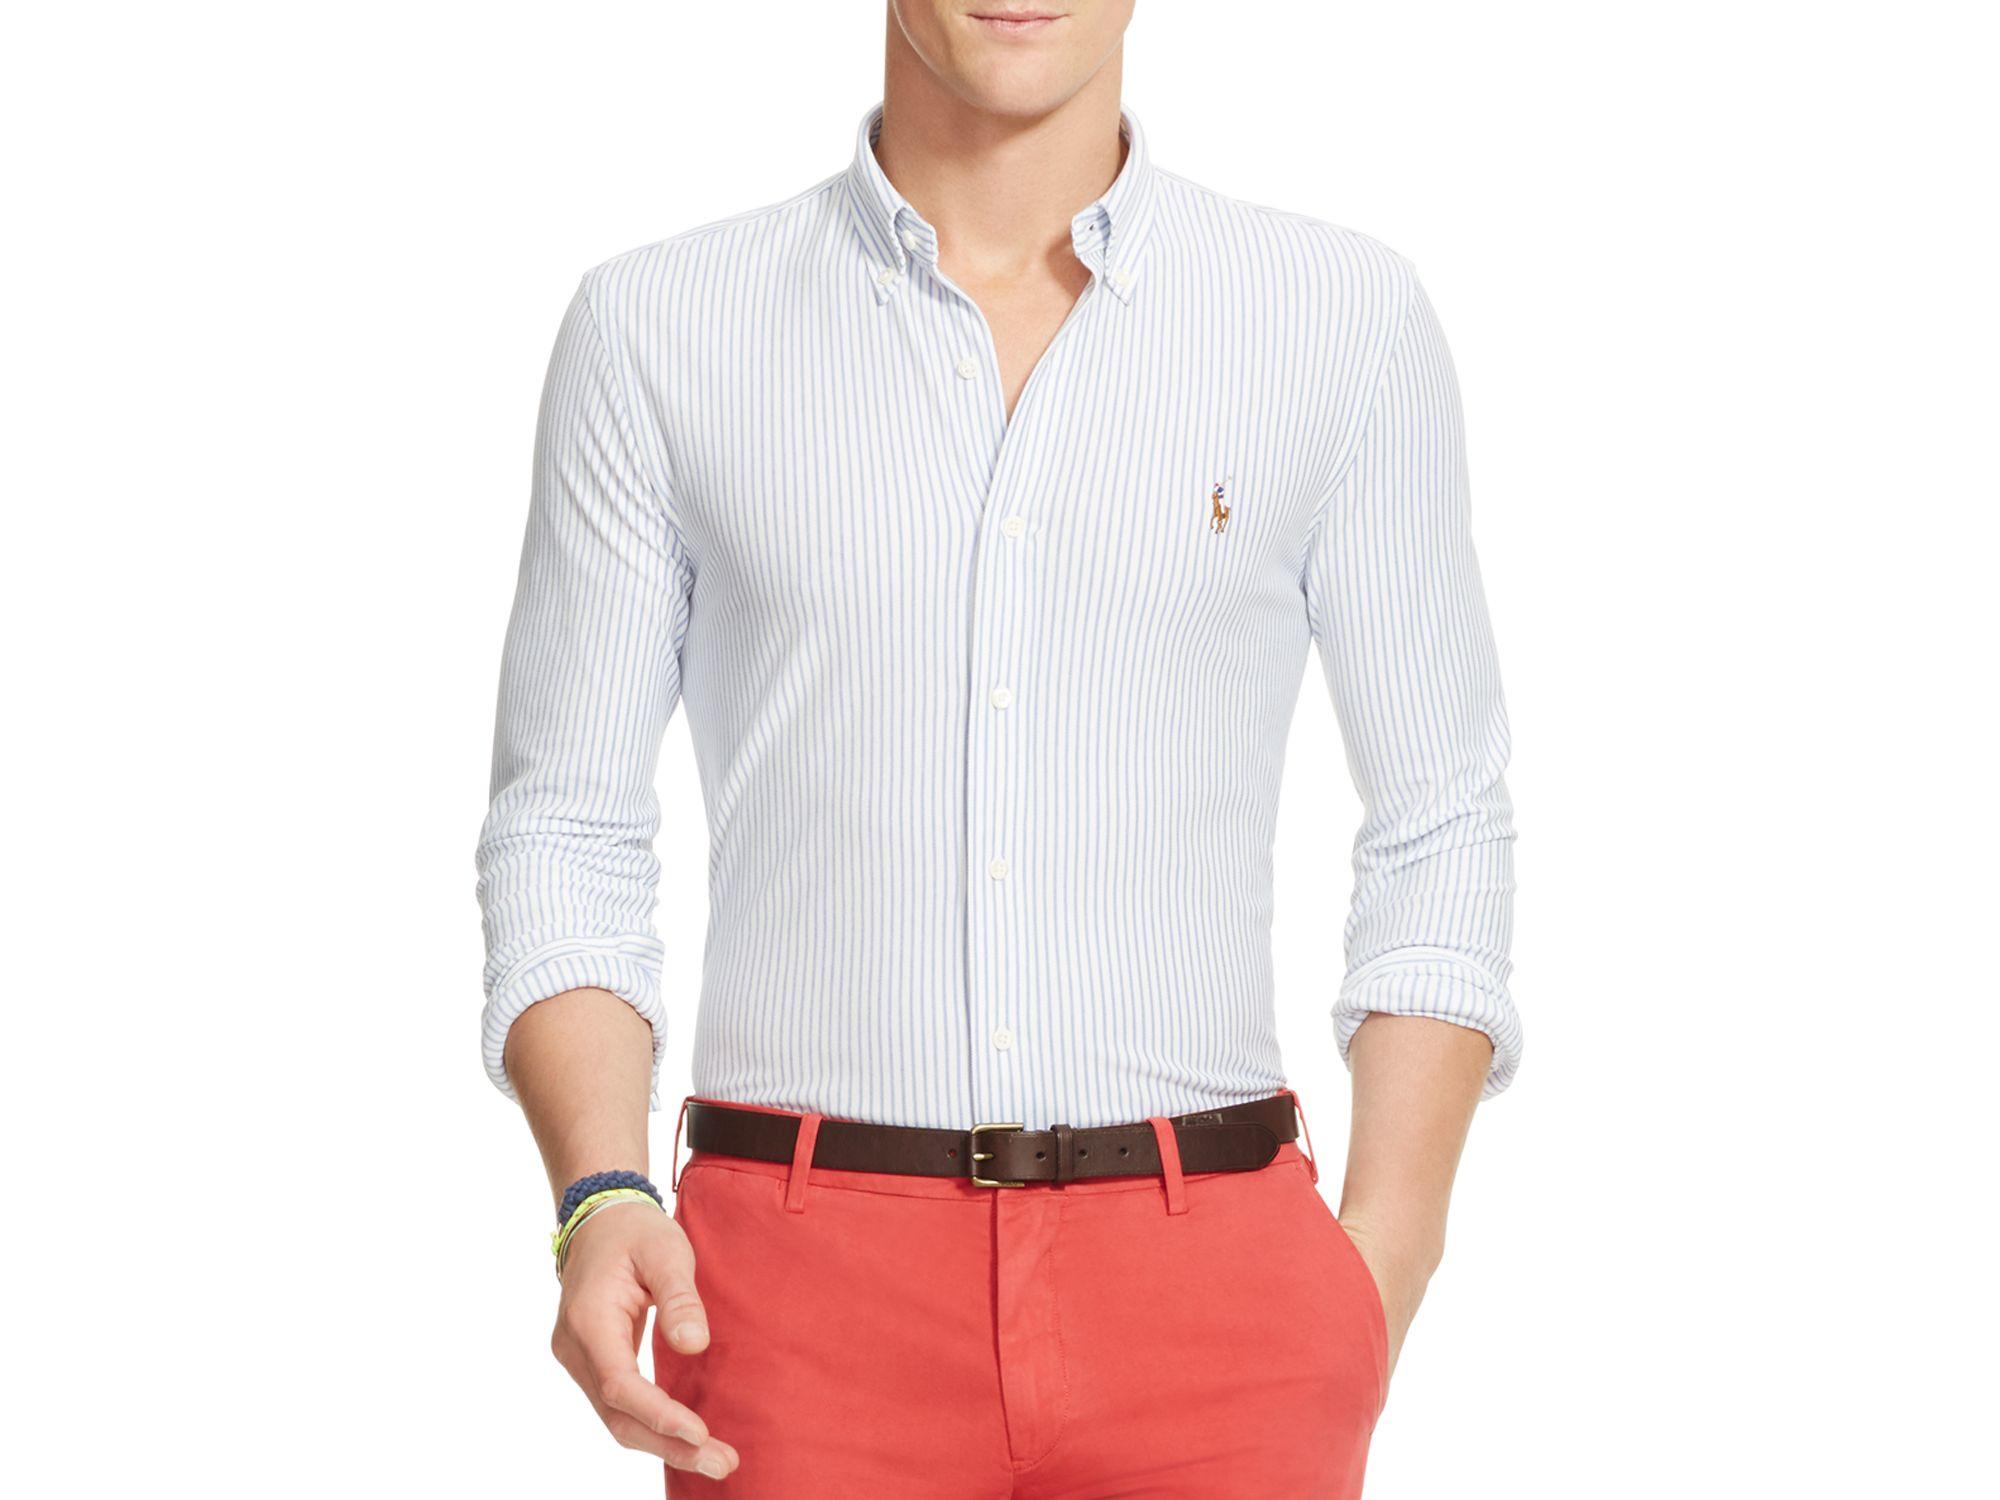 b8814557c Polo Ralph Lauren Striped Knit Oxford Slim Fit Button Down Shirt in ...